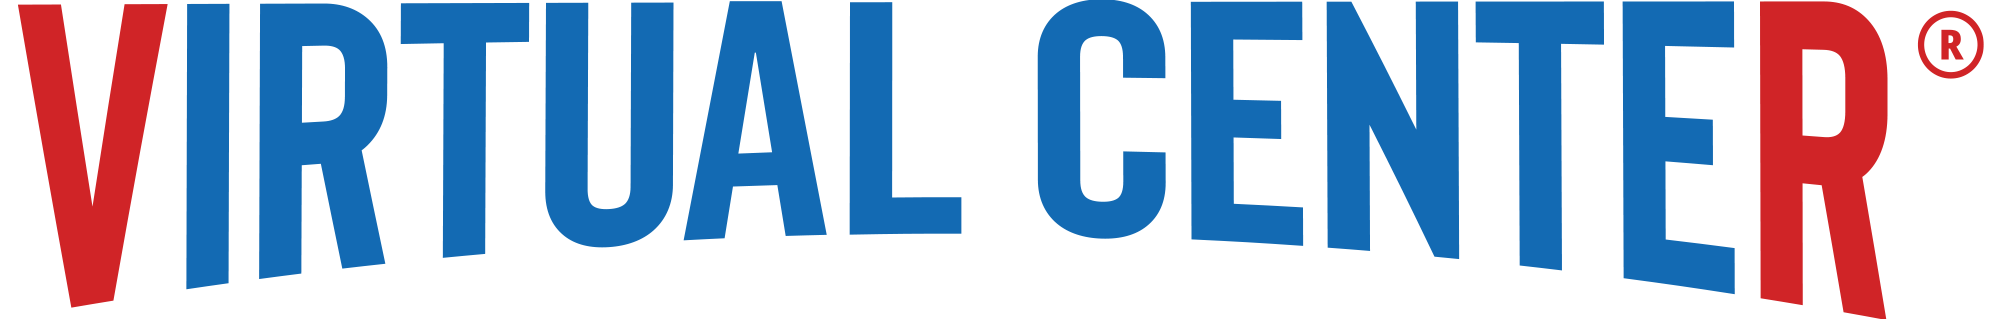 Virtual Center Lorient